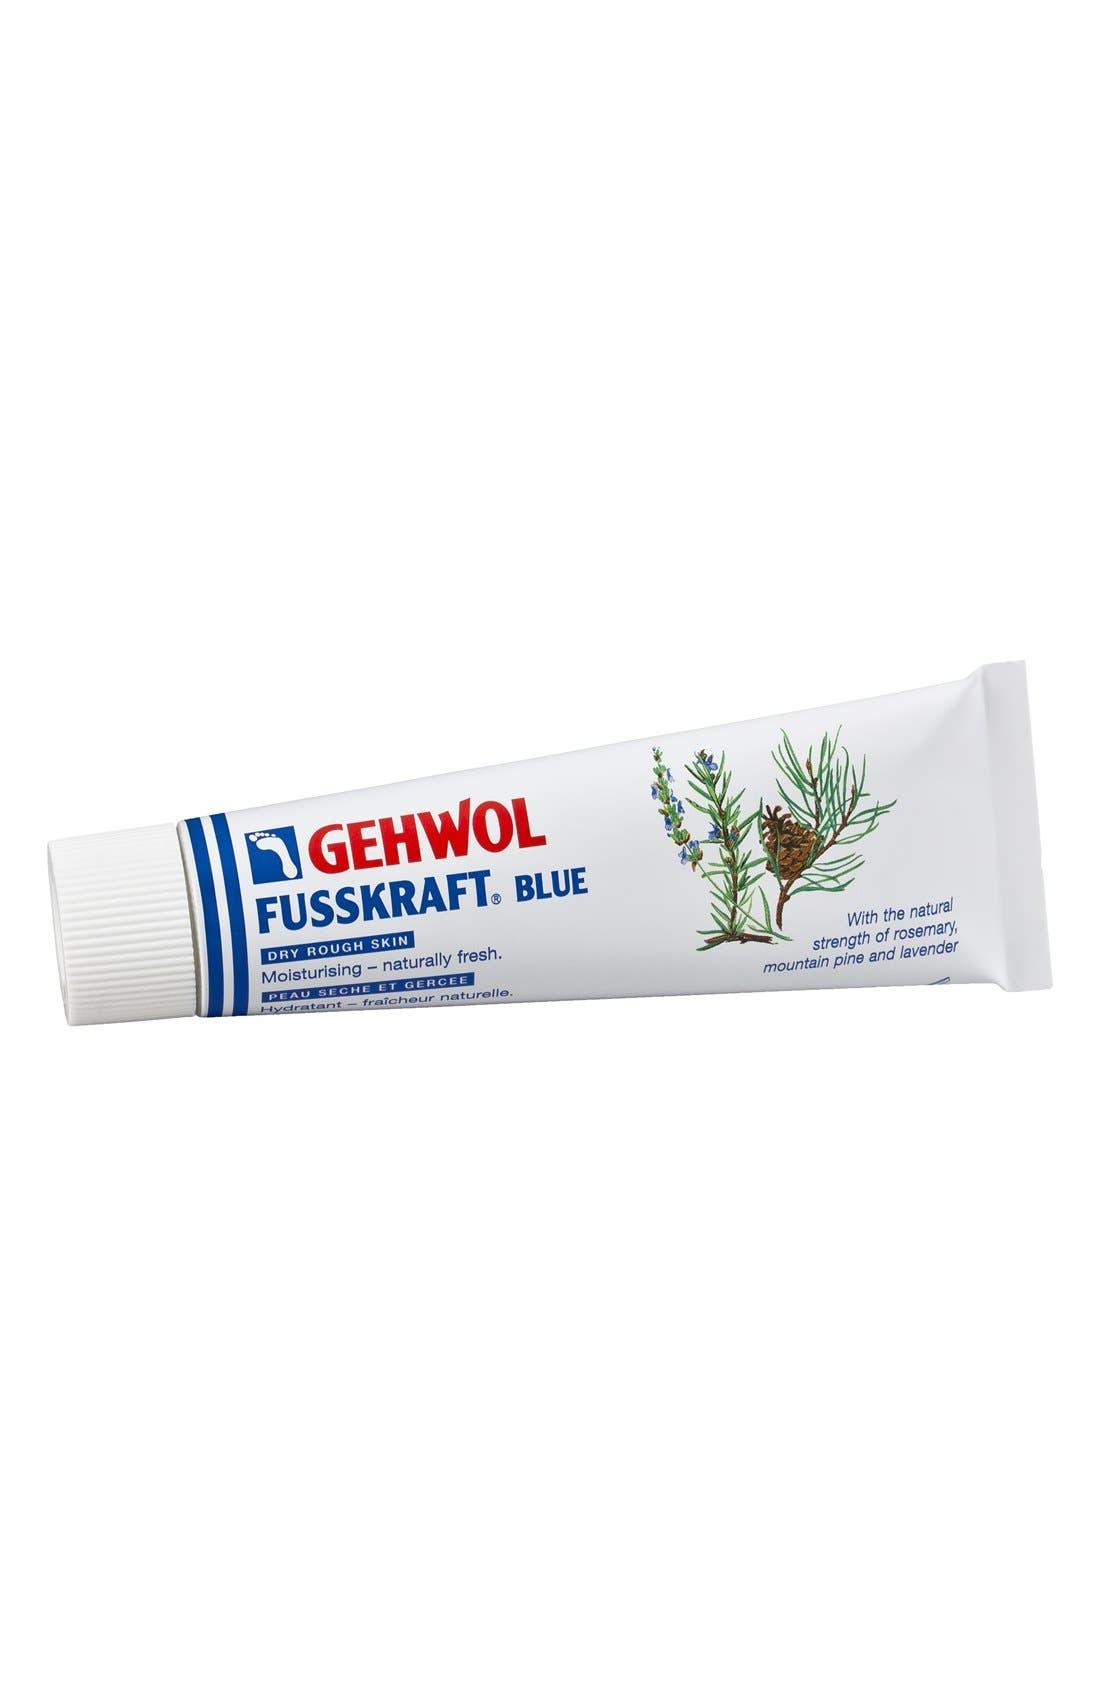 GEHWOL® FUSSKRAFT® Blue Foot Cream